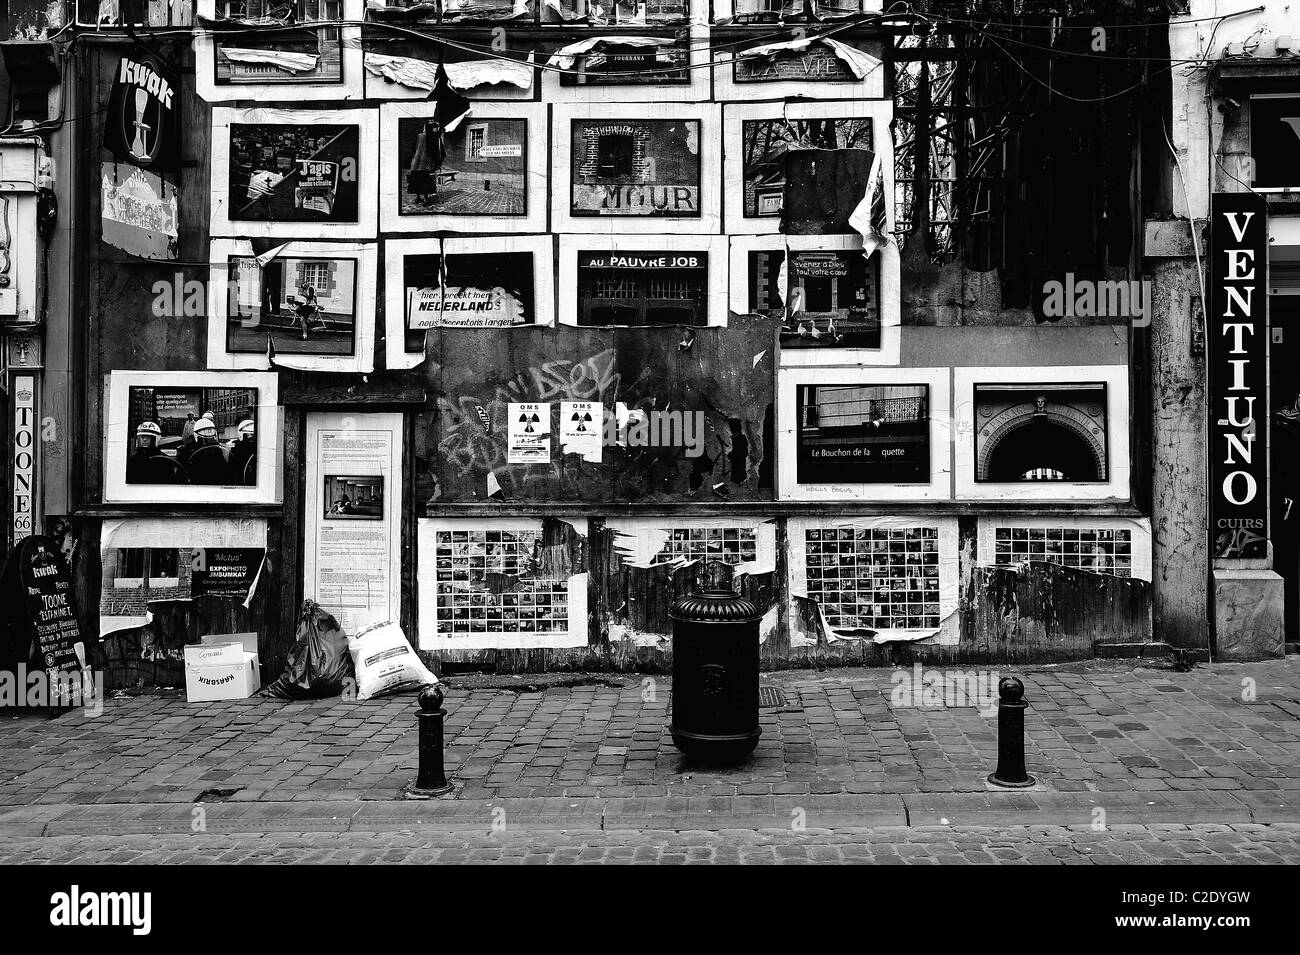 A decrepit building on Rue du Marché aux Herbes, Bruxelles/Grasmarkt, Brussels, Belgium, covered in posters Stock Photo